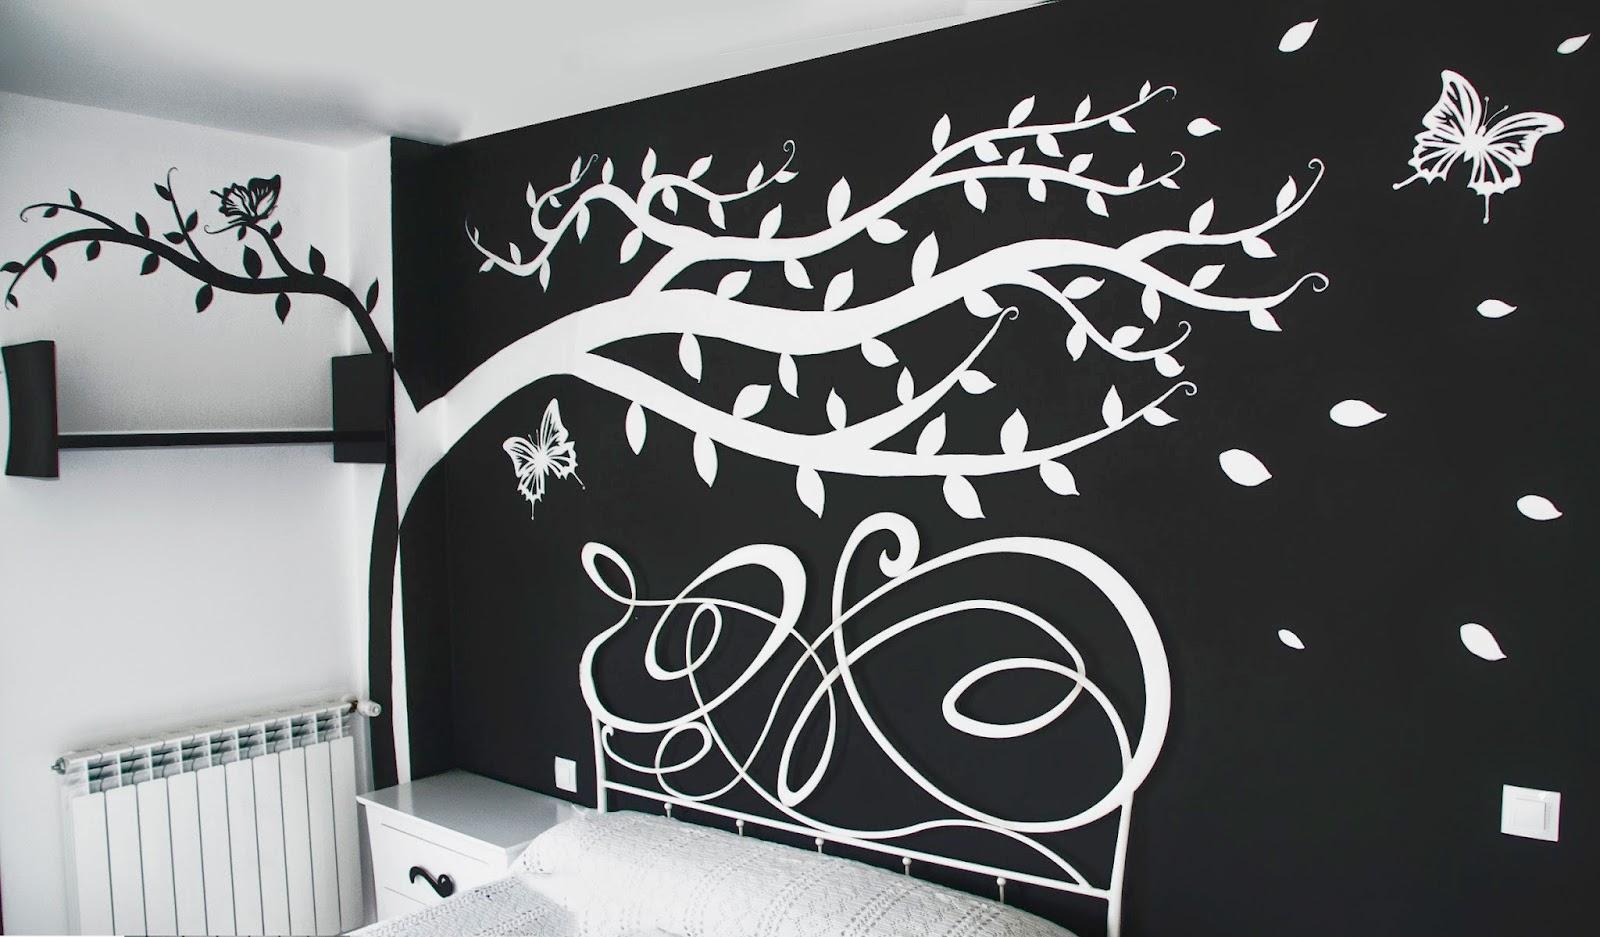 Mural lienzoymural - Pintura acrilica pared ...